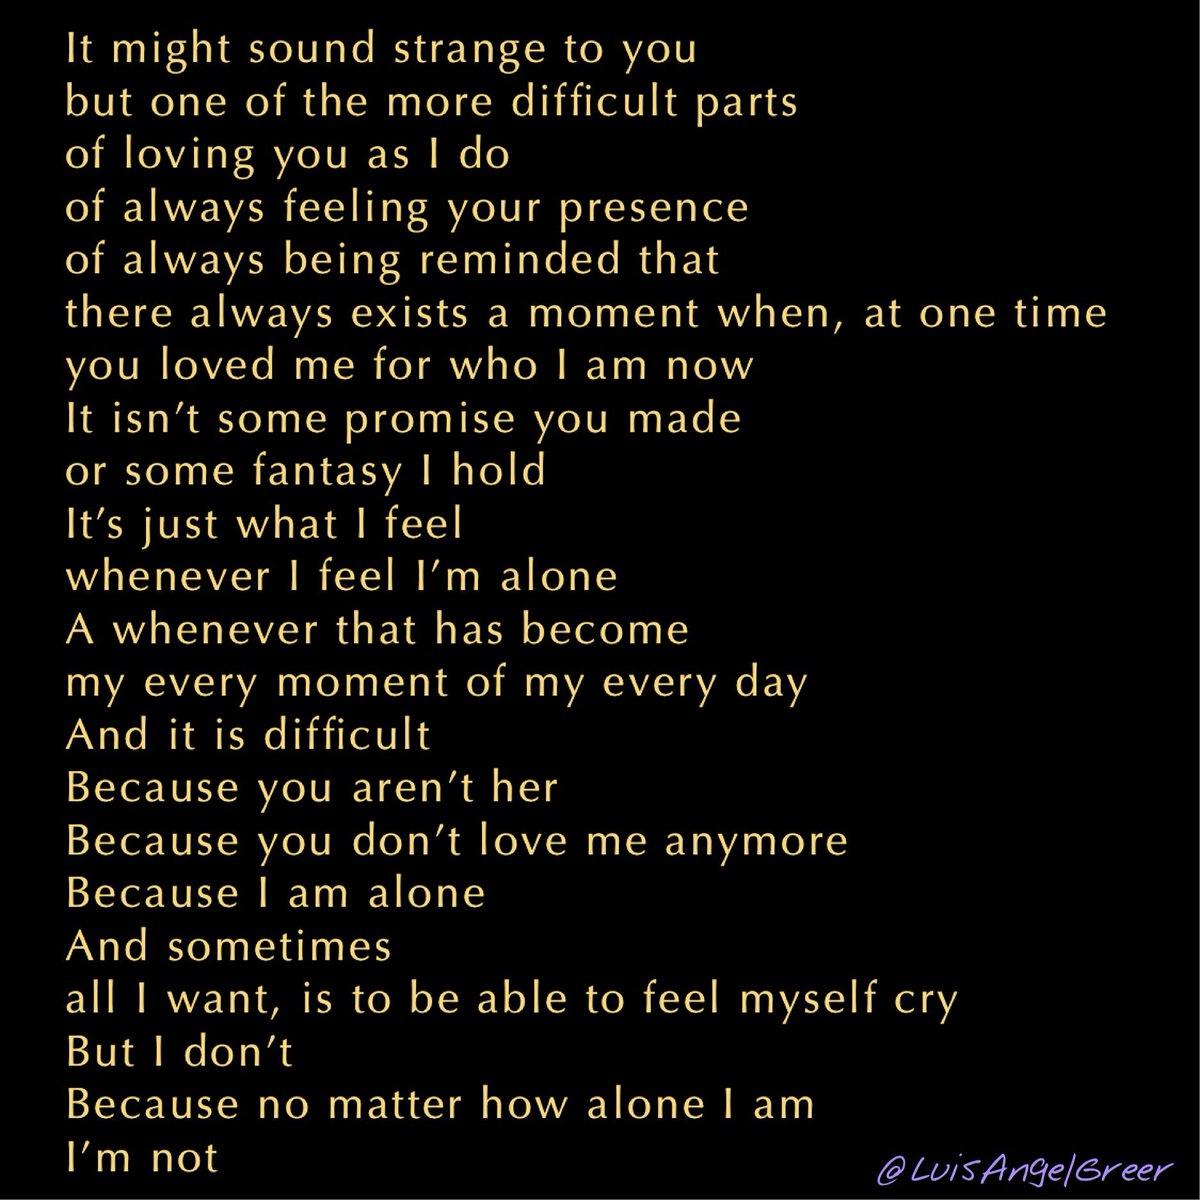 The opening thought for Wednesday, February 26, 2020.  #poem #poetry #prose #bleedingedgepoetry #originalpoetry #poetryforthesoul #spilledwords #spilledthoughts #spilledink #darkpoetry #humanityisafailedturingtest #love #lovepoem #lovepoemspic.twitter.com/ogDtdAztDJ